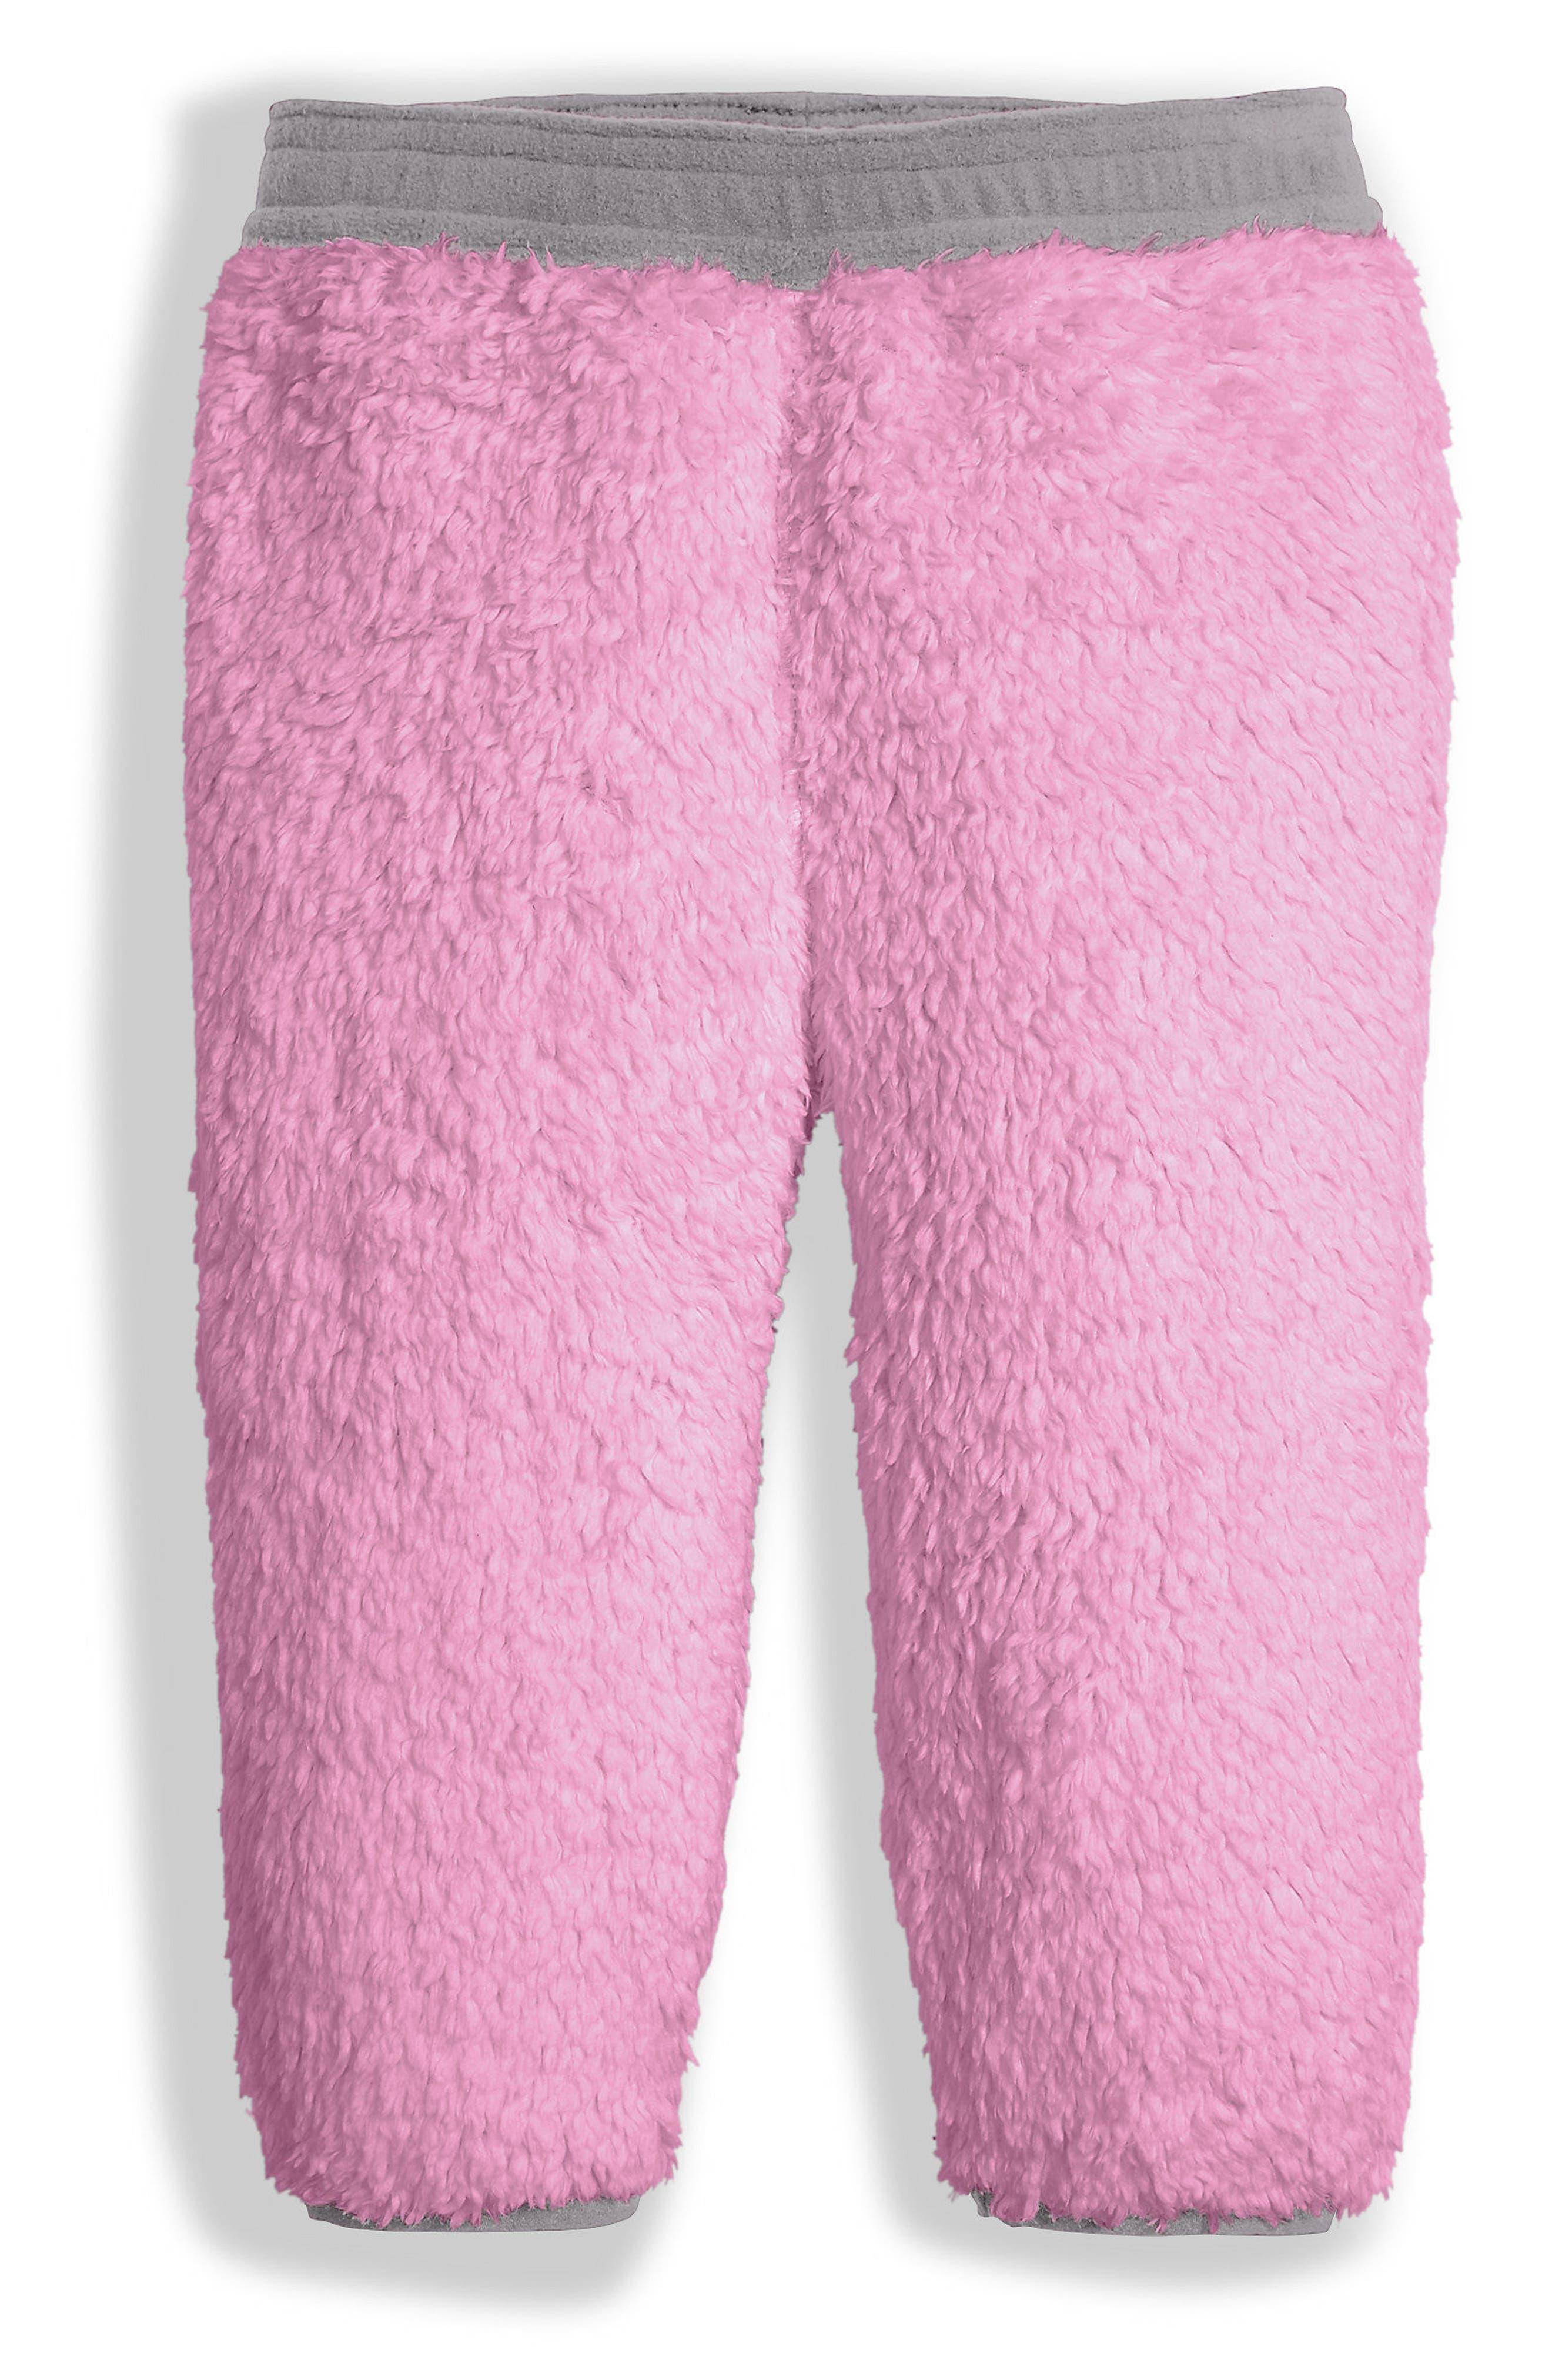 Plushee Pants,                         Main,                         color, Lilac/ Sachet Pink